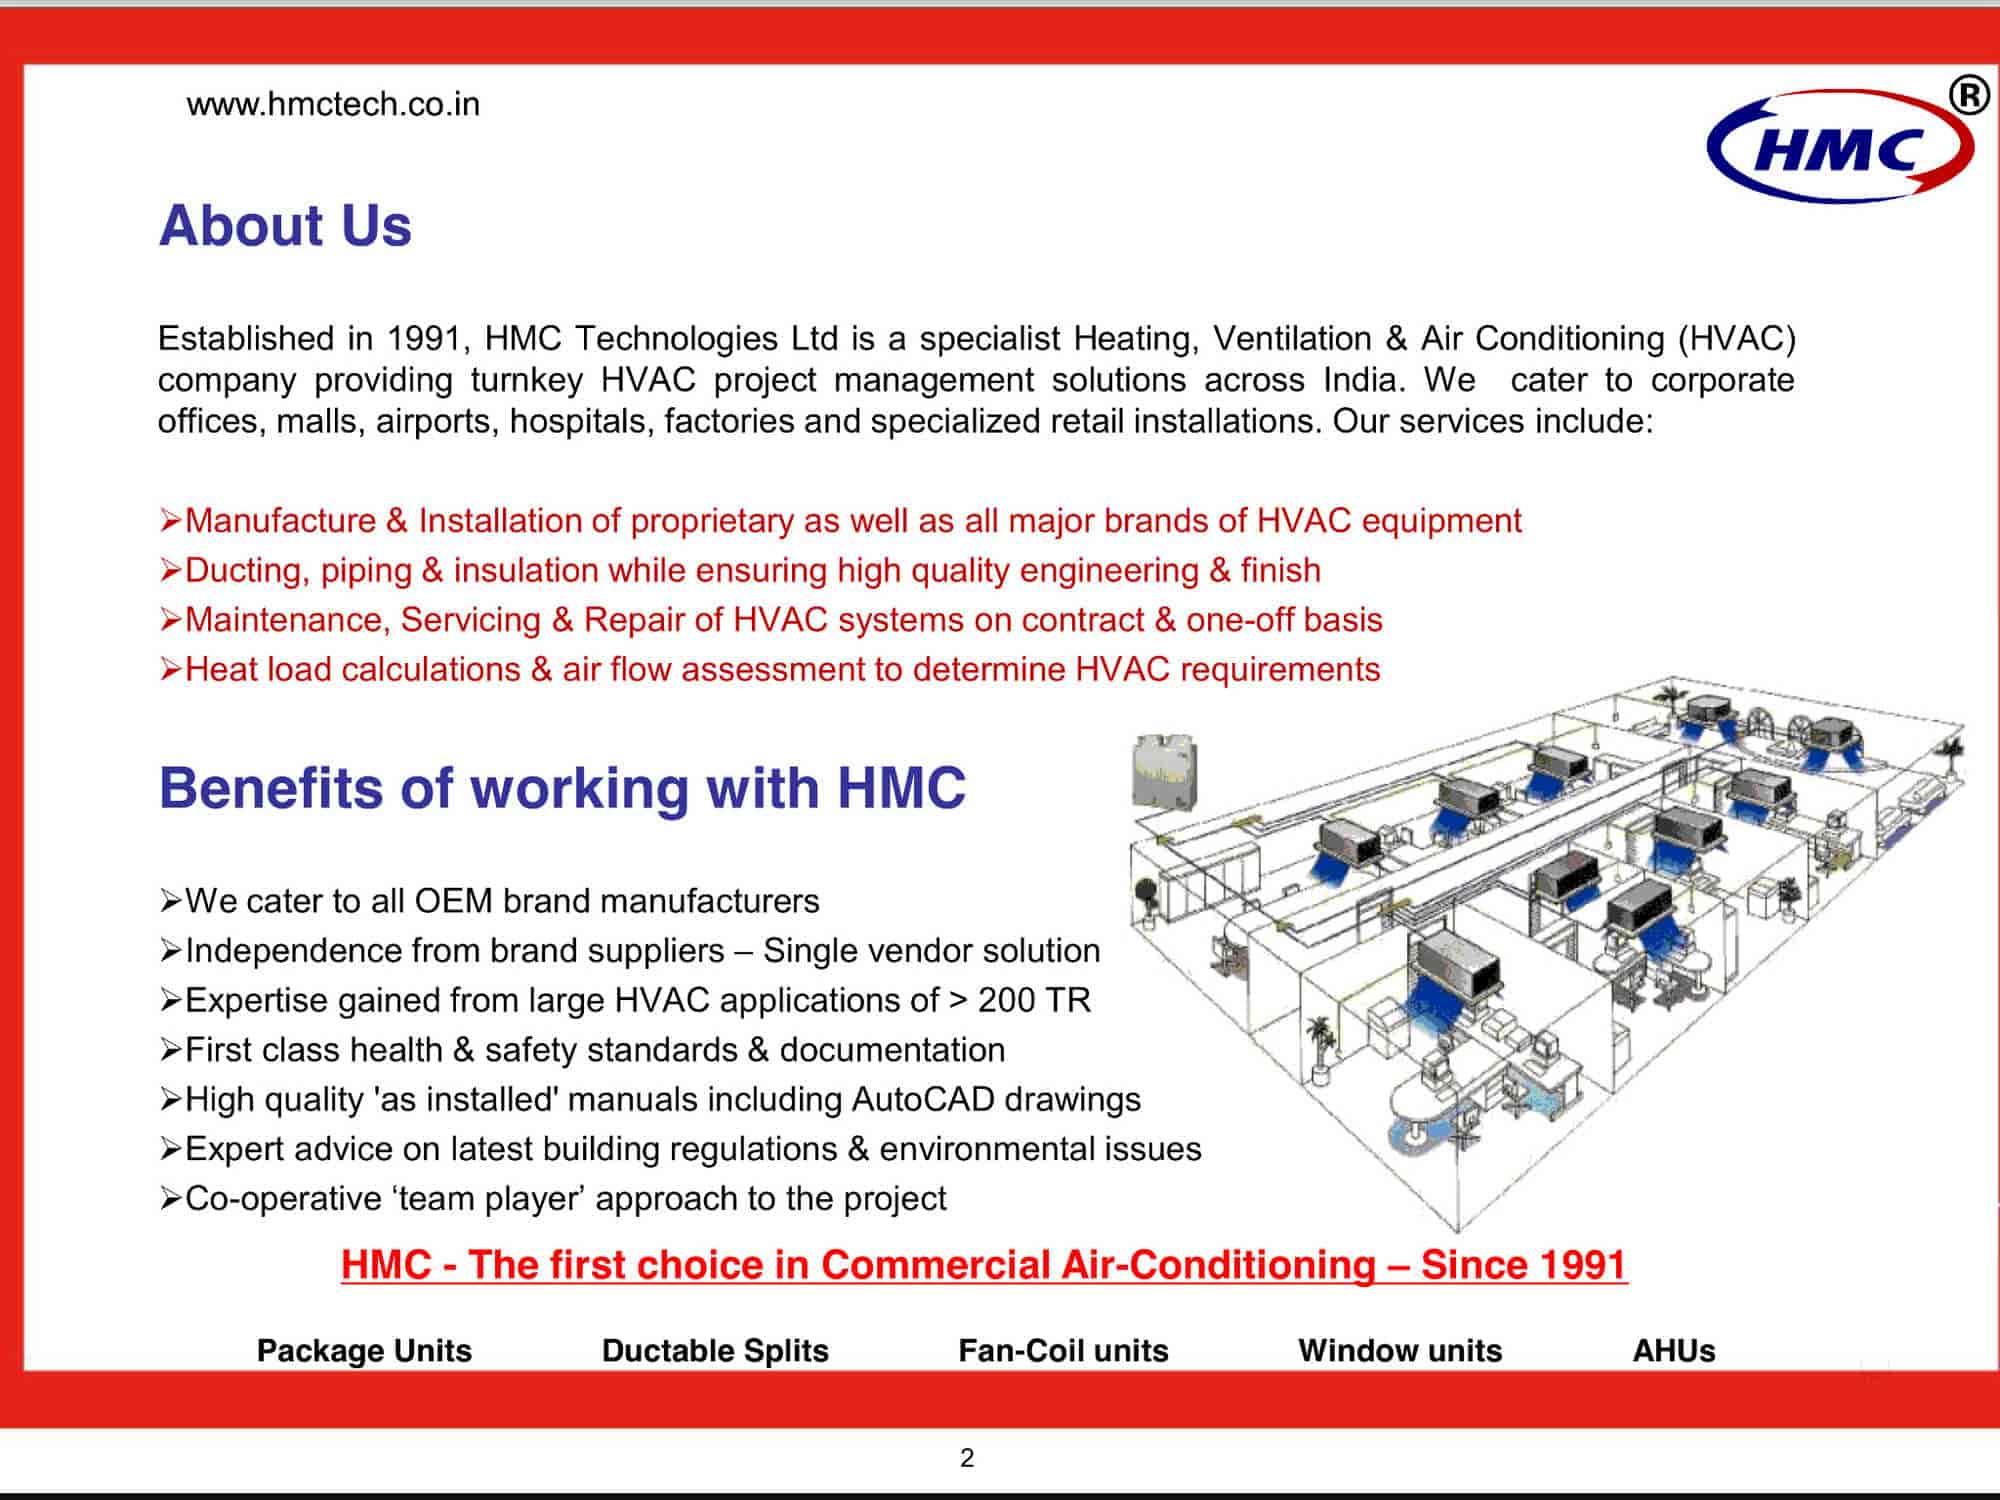 Hmc Technologies Ltd, East Of Kailash - AC Dealers in Delhi